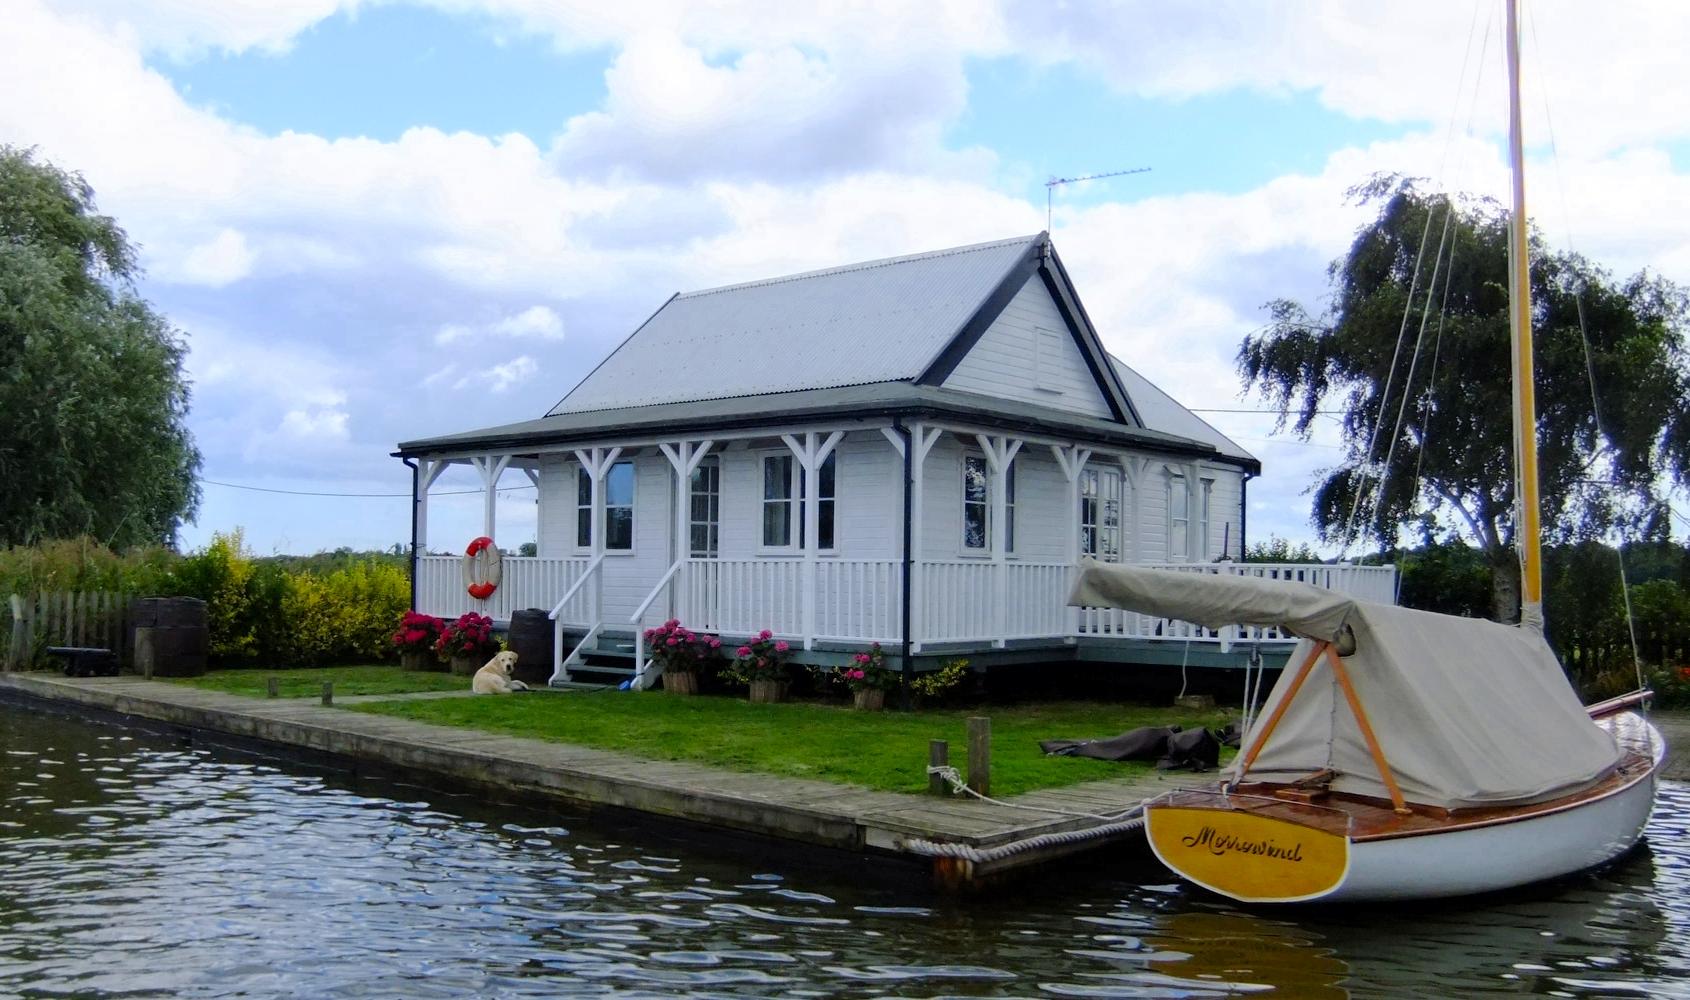 sukie norfolk broads holiday cottage